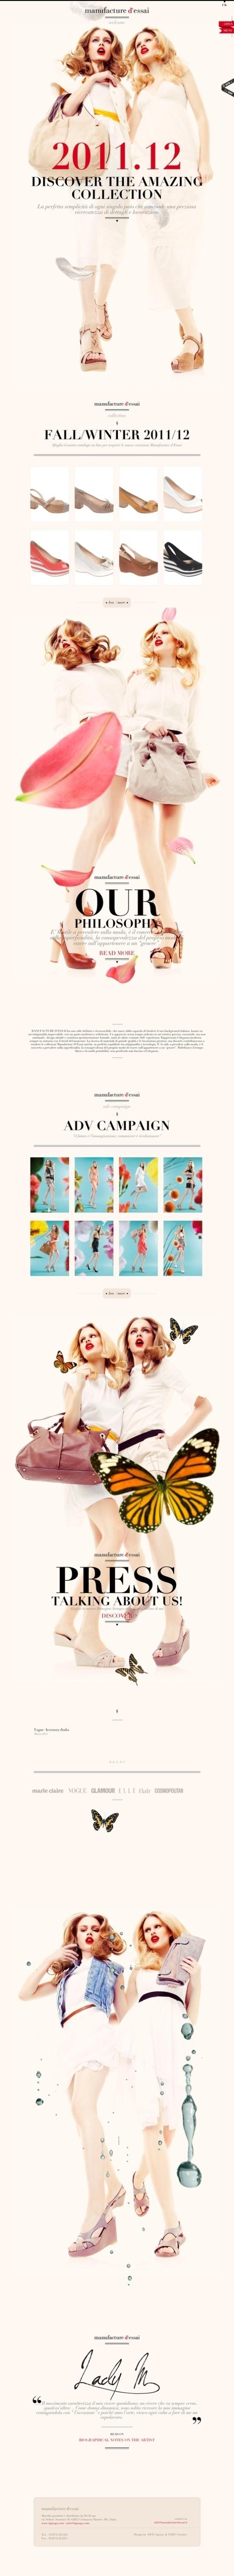 DesignersMX: Manufacture d'essai by JeremyMitchell #fashion #design #website #shoes